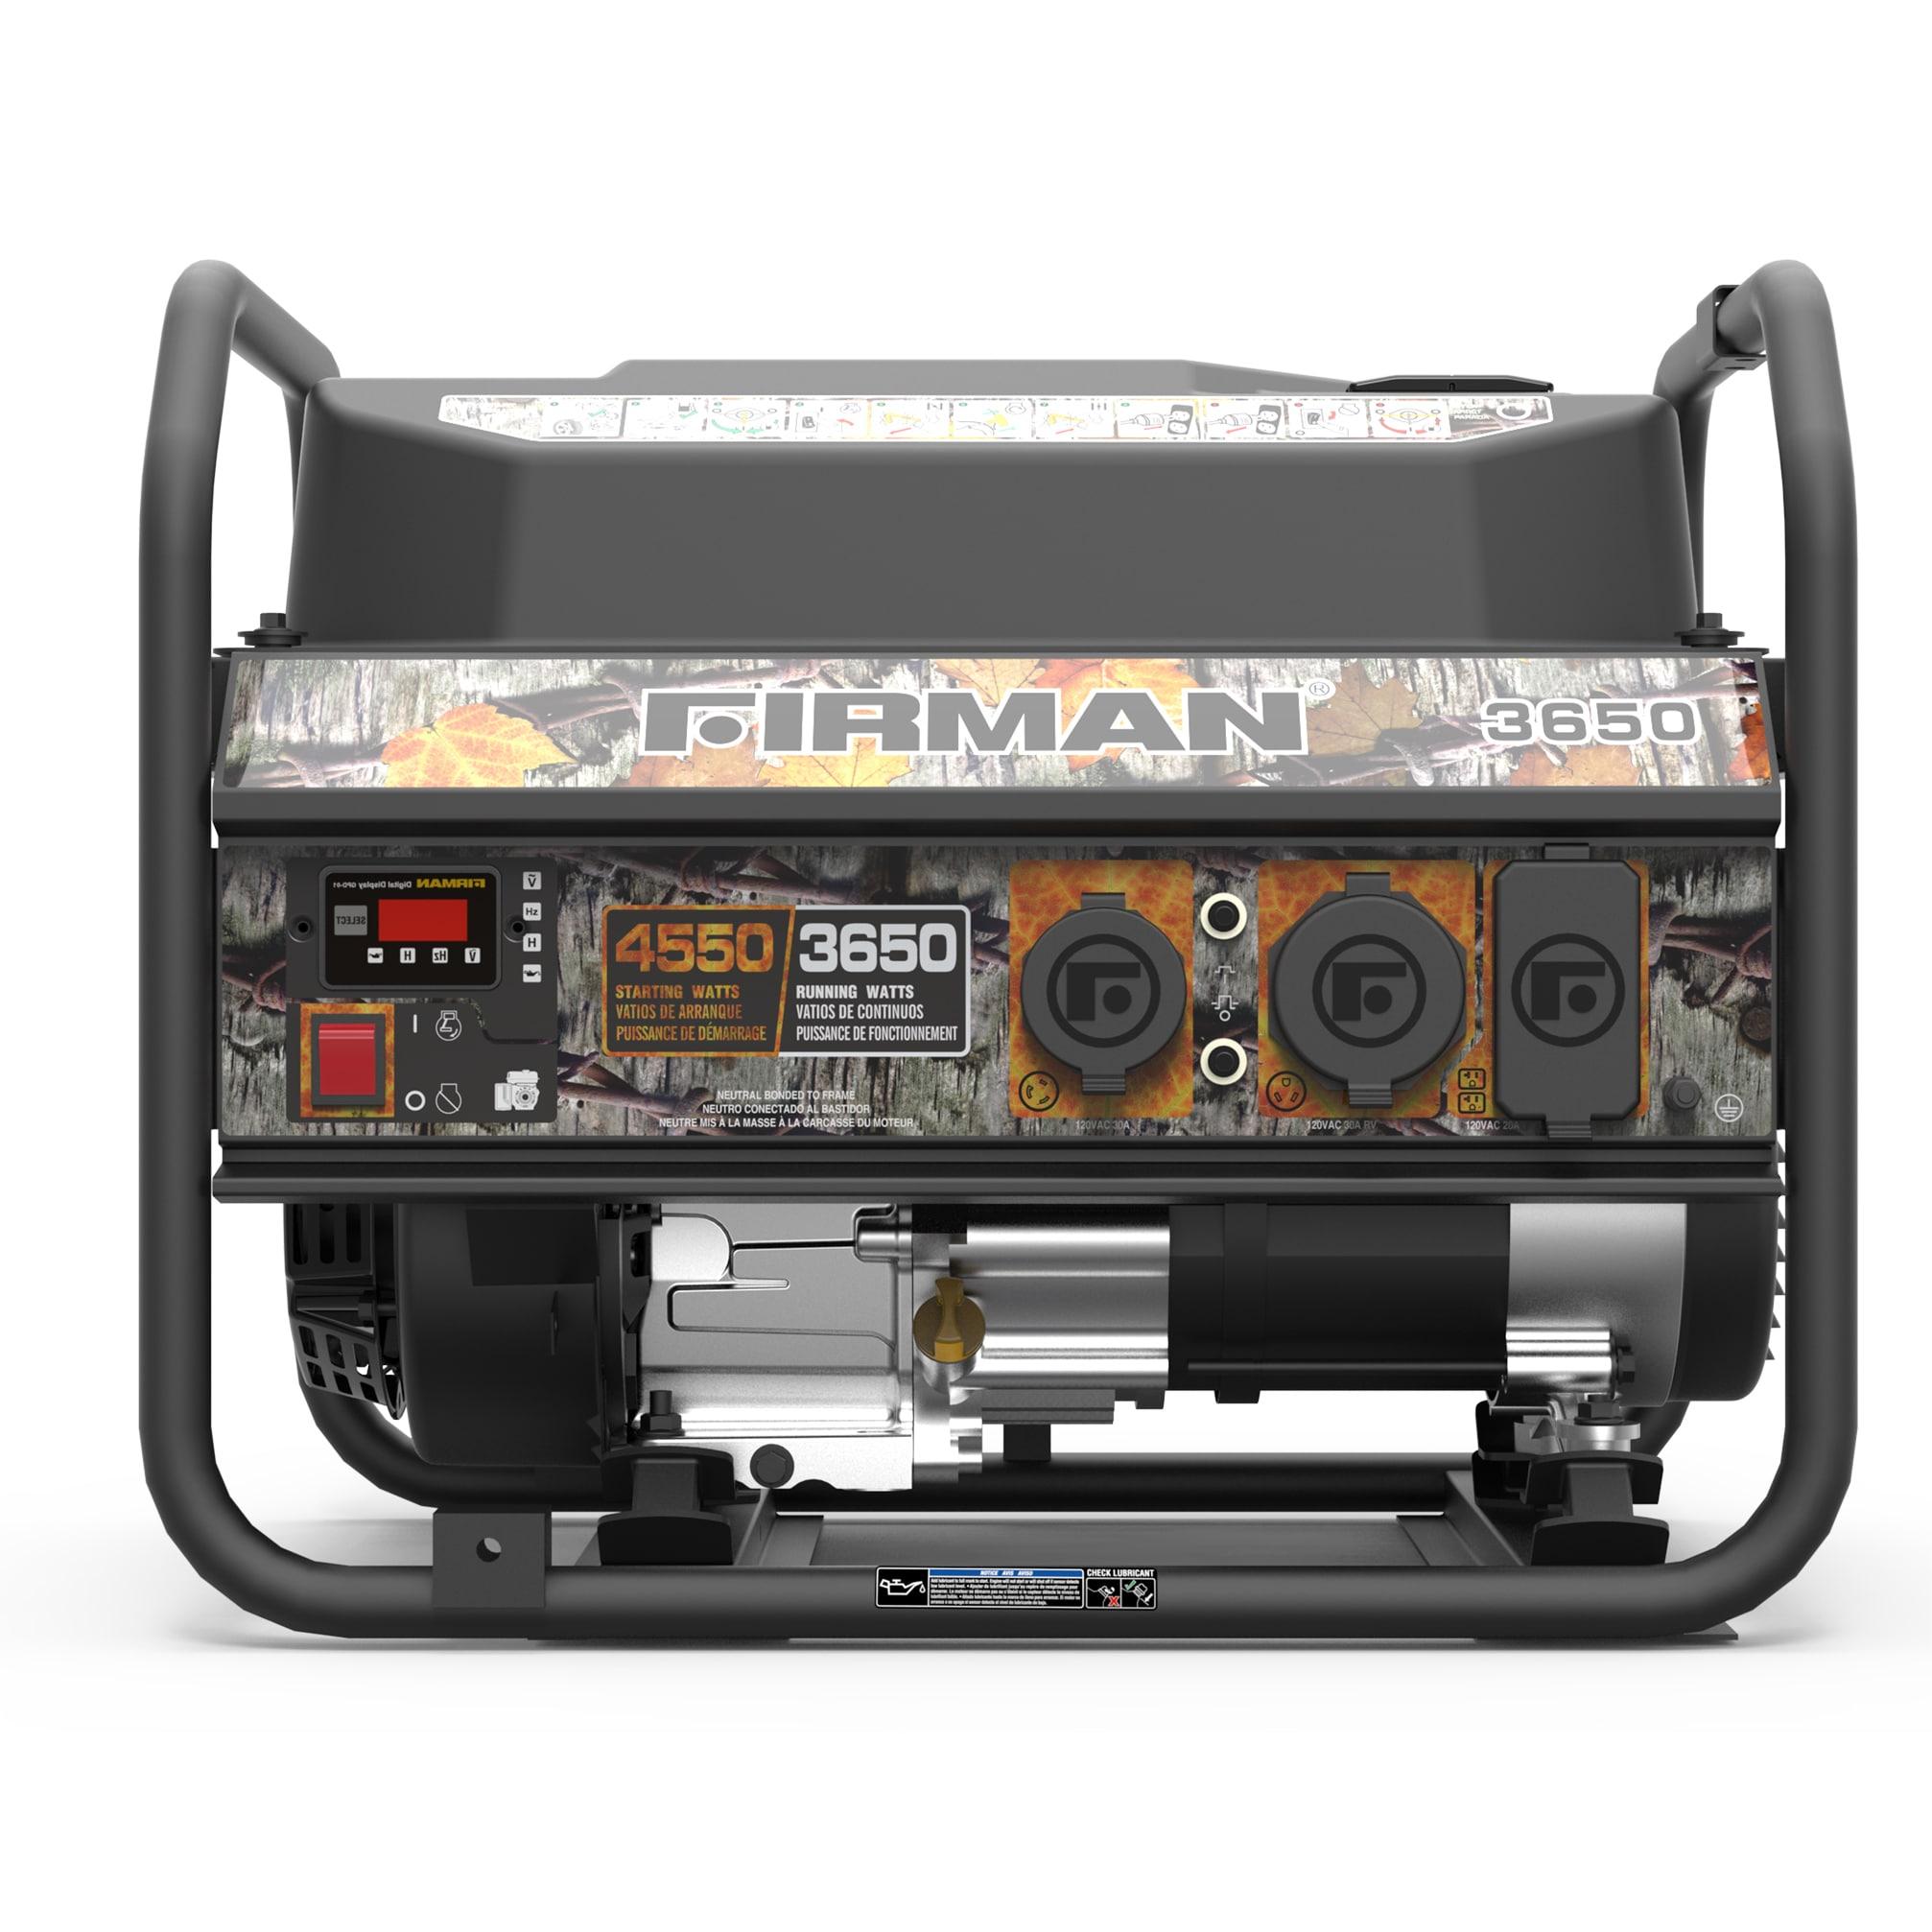 Firman Performance Series P Camo Edition Gas Powered 3650